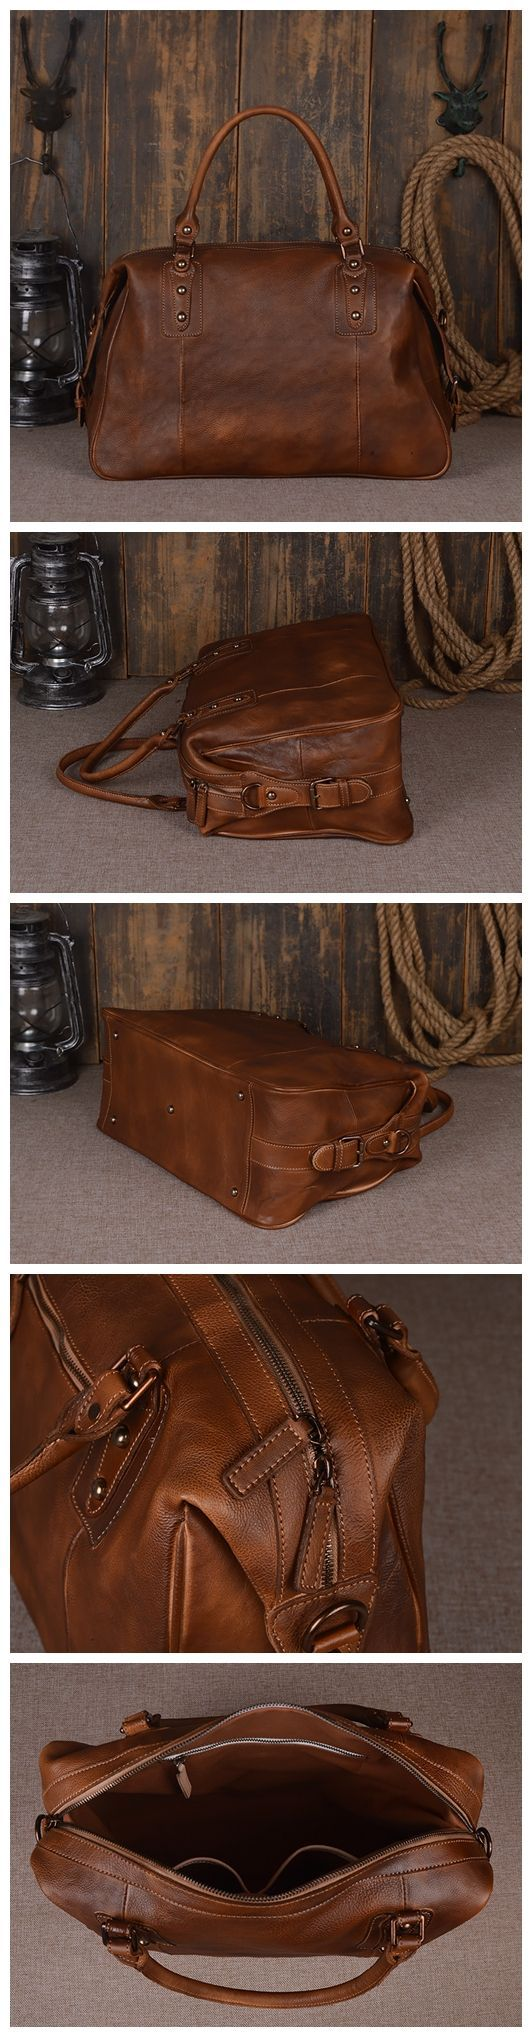 "Model Number: 9029 Dimensions: 16.9""L x 6.7""W x 11.4""H / 43cm(L) x 17cm(W) x 29cm(H) Weight: 3.5lb / 1.6kg Hardware: Brass Hardware Shoulder Strap: Adjustable & Removable Color: Vintage Brown / Blue G - bags handbags, handmade bags, black and red bag *sponsored https://www.pinterest.com/bags_bag/ https://www.pinterest.com/explore/bags/ https://www.pinterest.com/bags_bag/messenger-bags/ http://www.forever21.com/EU/Product/Category.aspx?br=F21&category=ACC_Handbags"